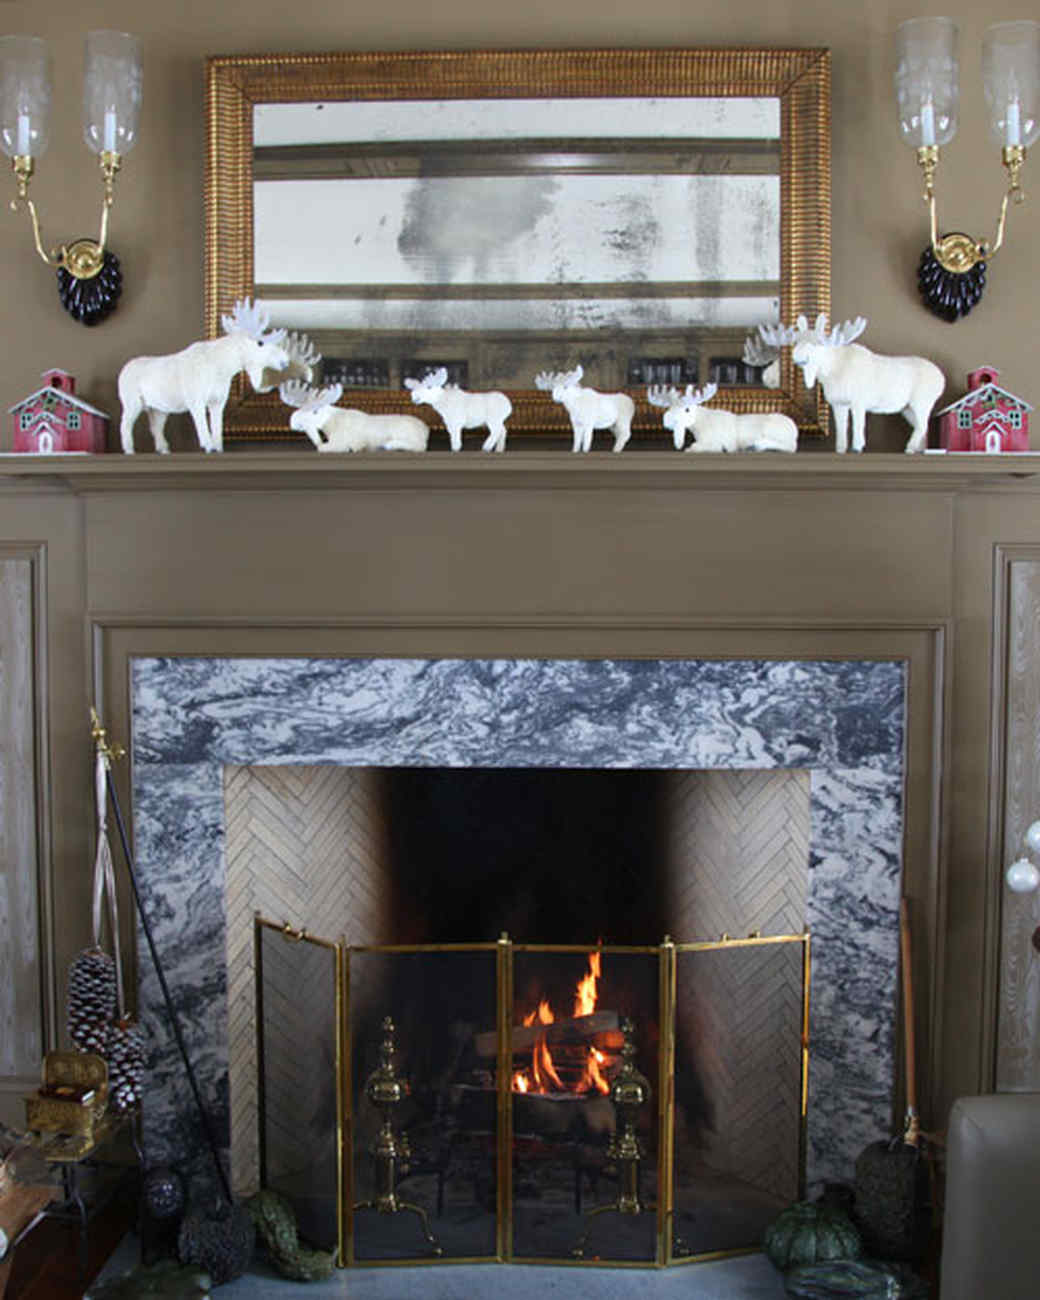 martha-christmas-2010-moose-1289.jpg